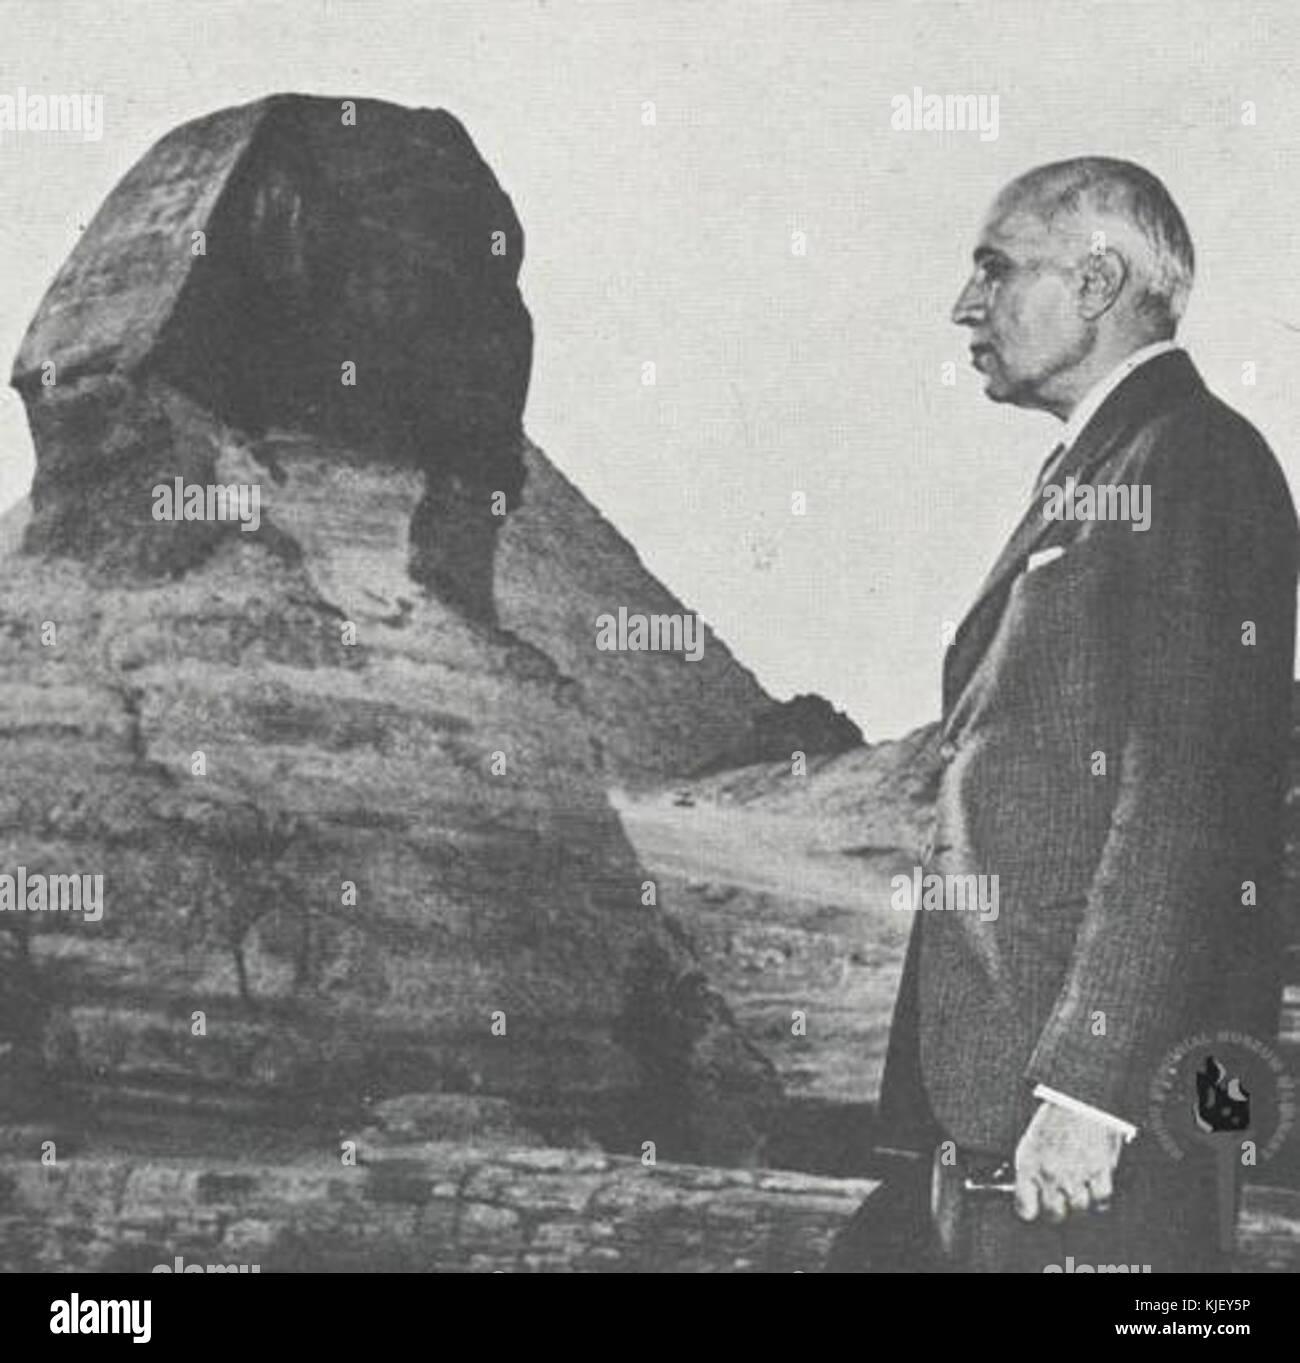 Jawaharlal Nehru at the Sphinx - Stock Image